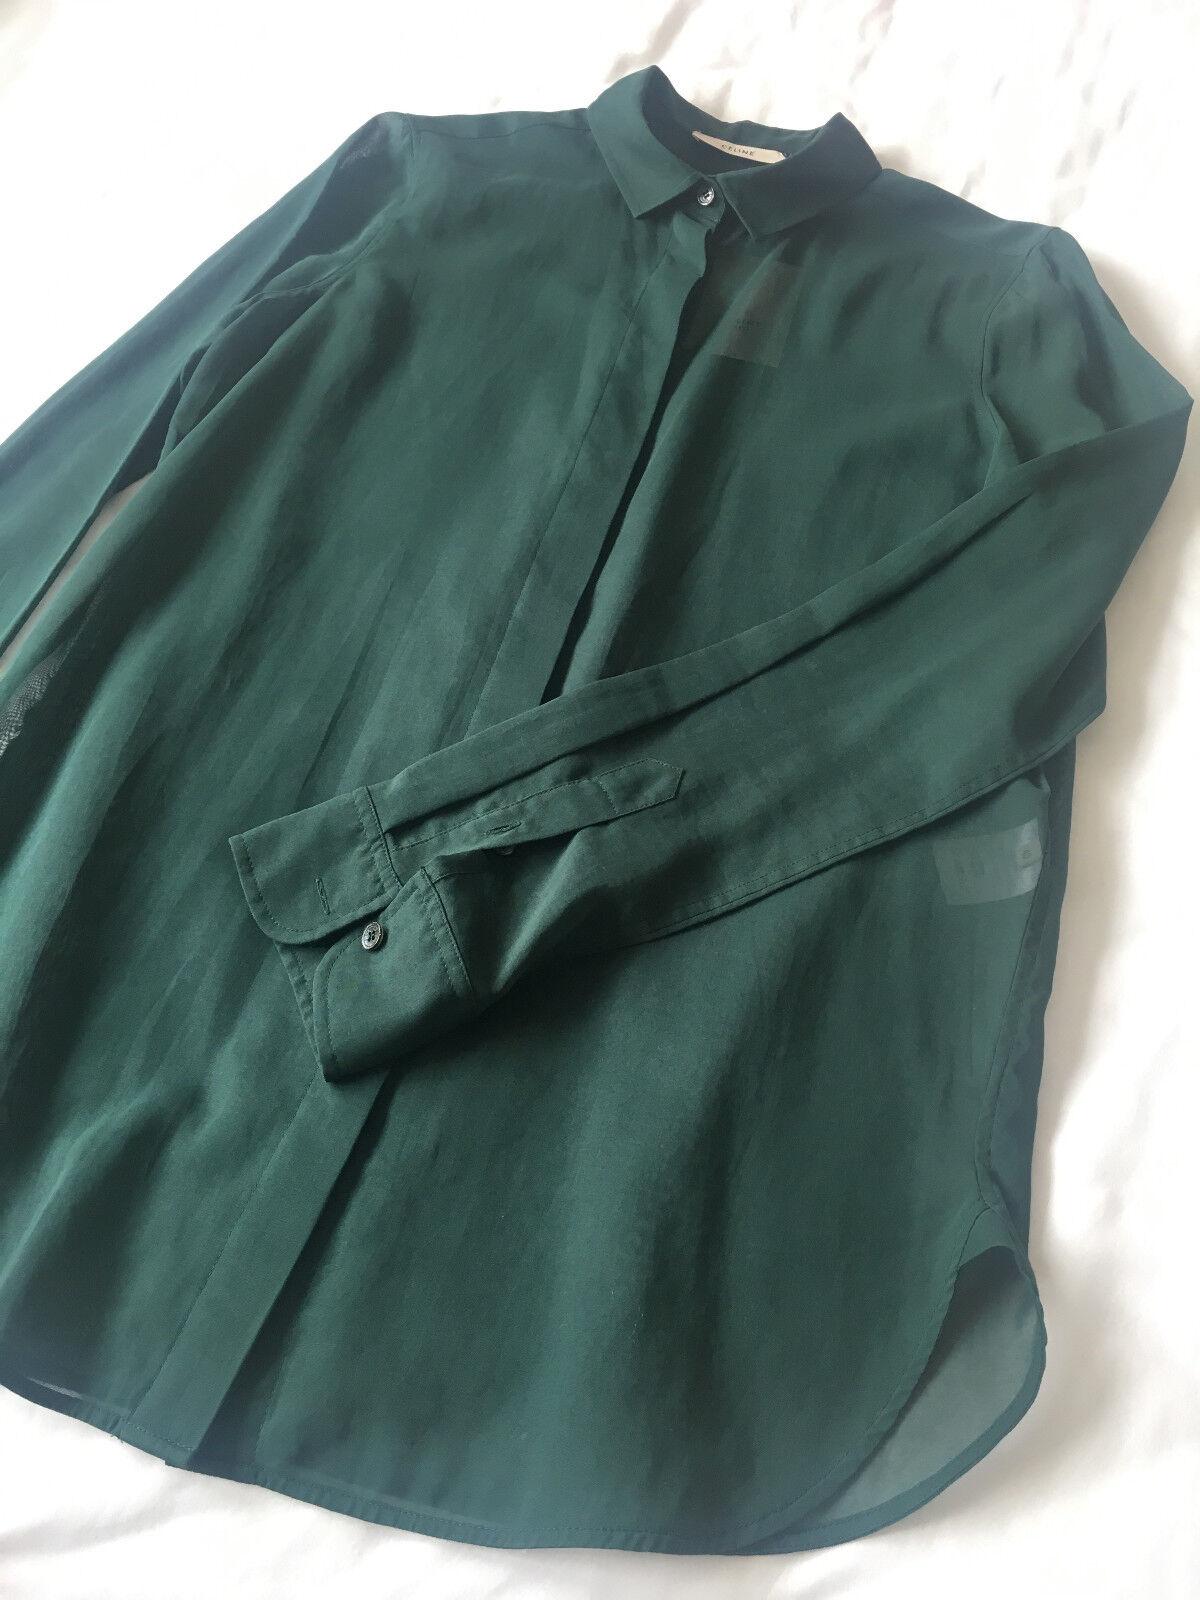 CELINE Forest Grün 100% Cotton Sheer Shirt 40 UK10